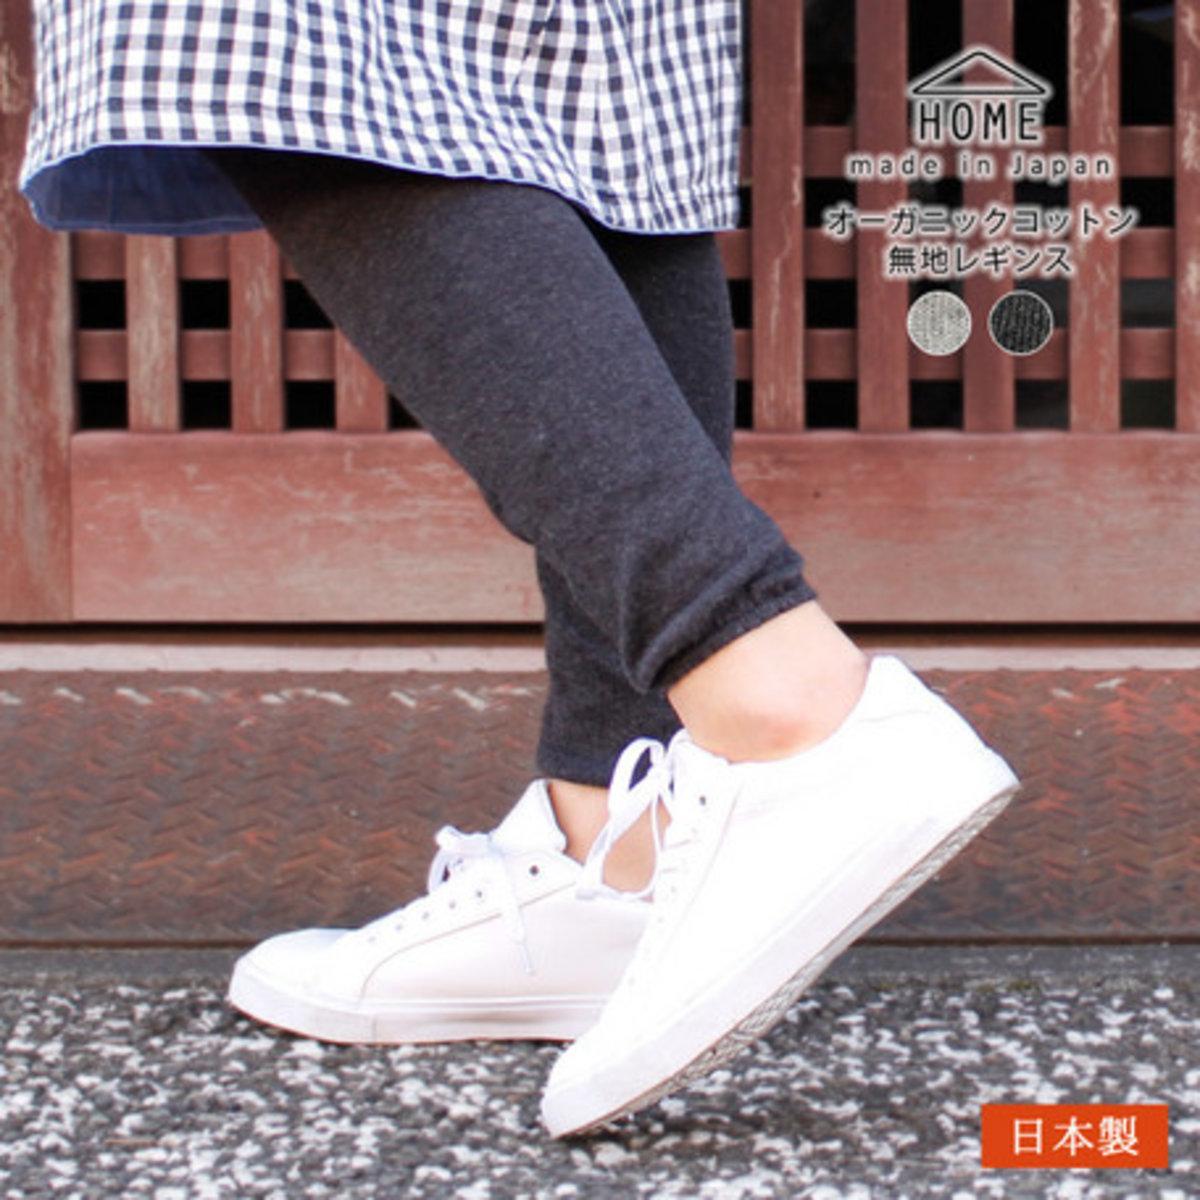 Japanese 100% Organic Cotton Leggings 1pc (Color : Dark Grey)